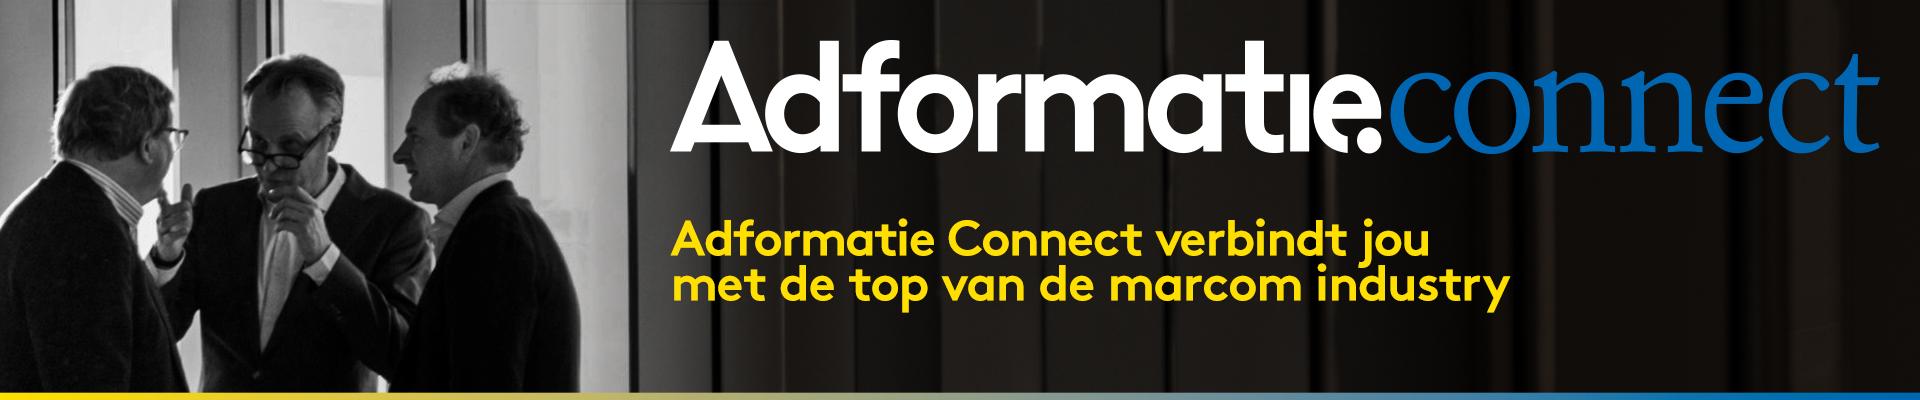 Adformatie Connect 2020